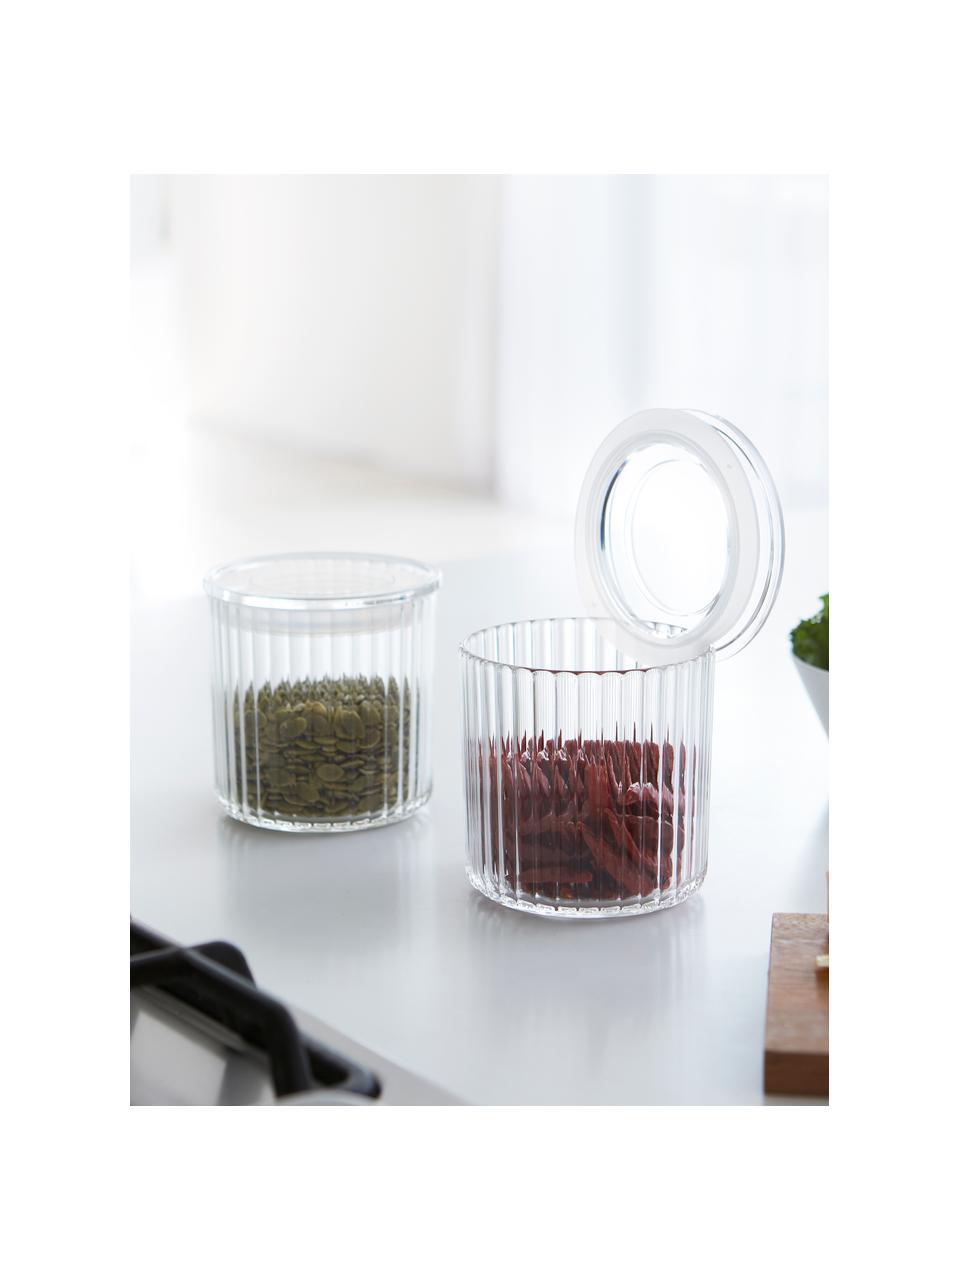 Aufbewahrungsdose Fonte aus Kunststoff, Ø 10 x H 11 cm, Kunststoff (PMS), Transparent, Ø 10 x H 11 cm